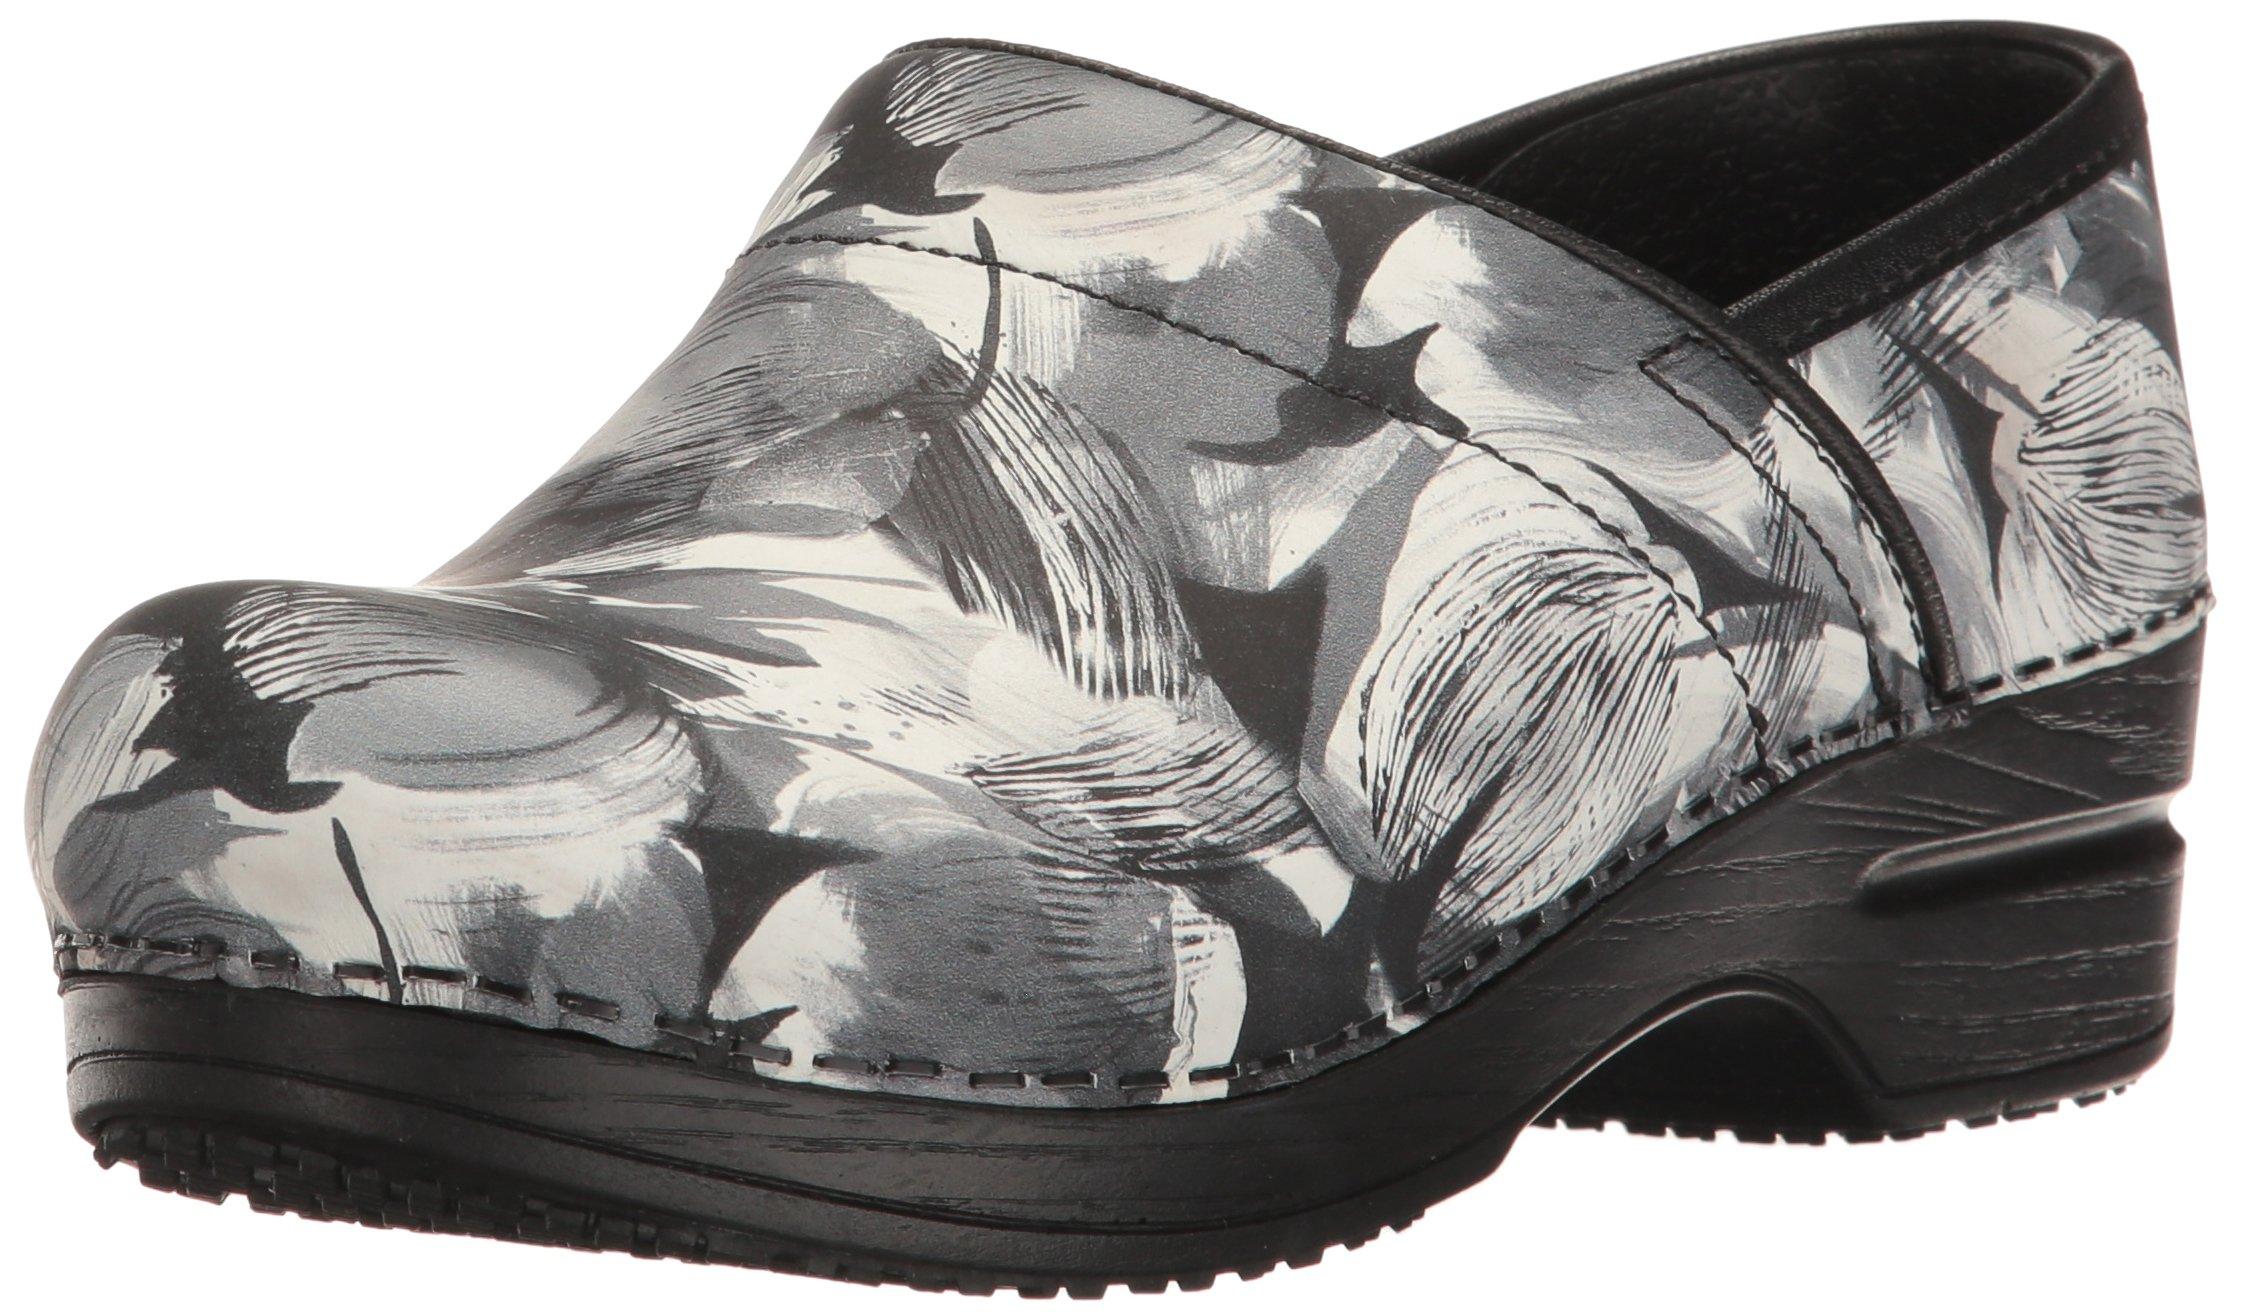 Sanita Women's Smart Step Sharon Work Shoe, Black, 39 EU/8/8.5 M US